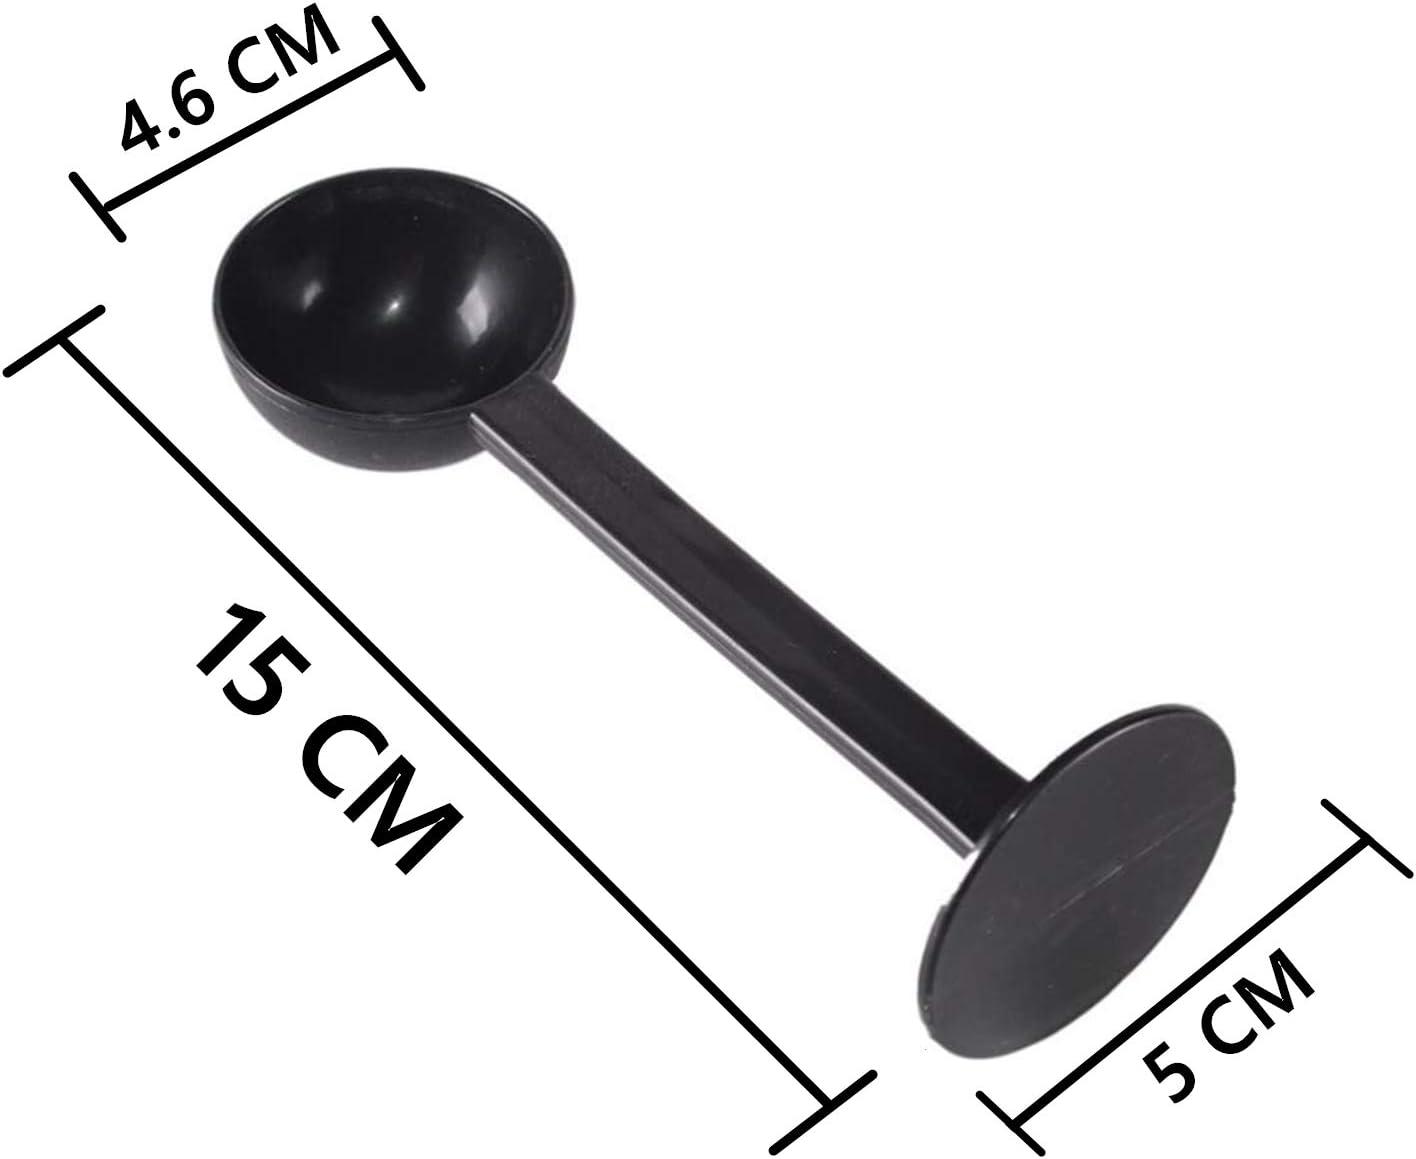 Lautechco 10pcs Coffee Measuring Spoon 10g